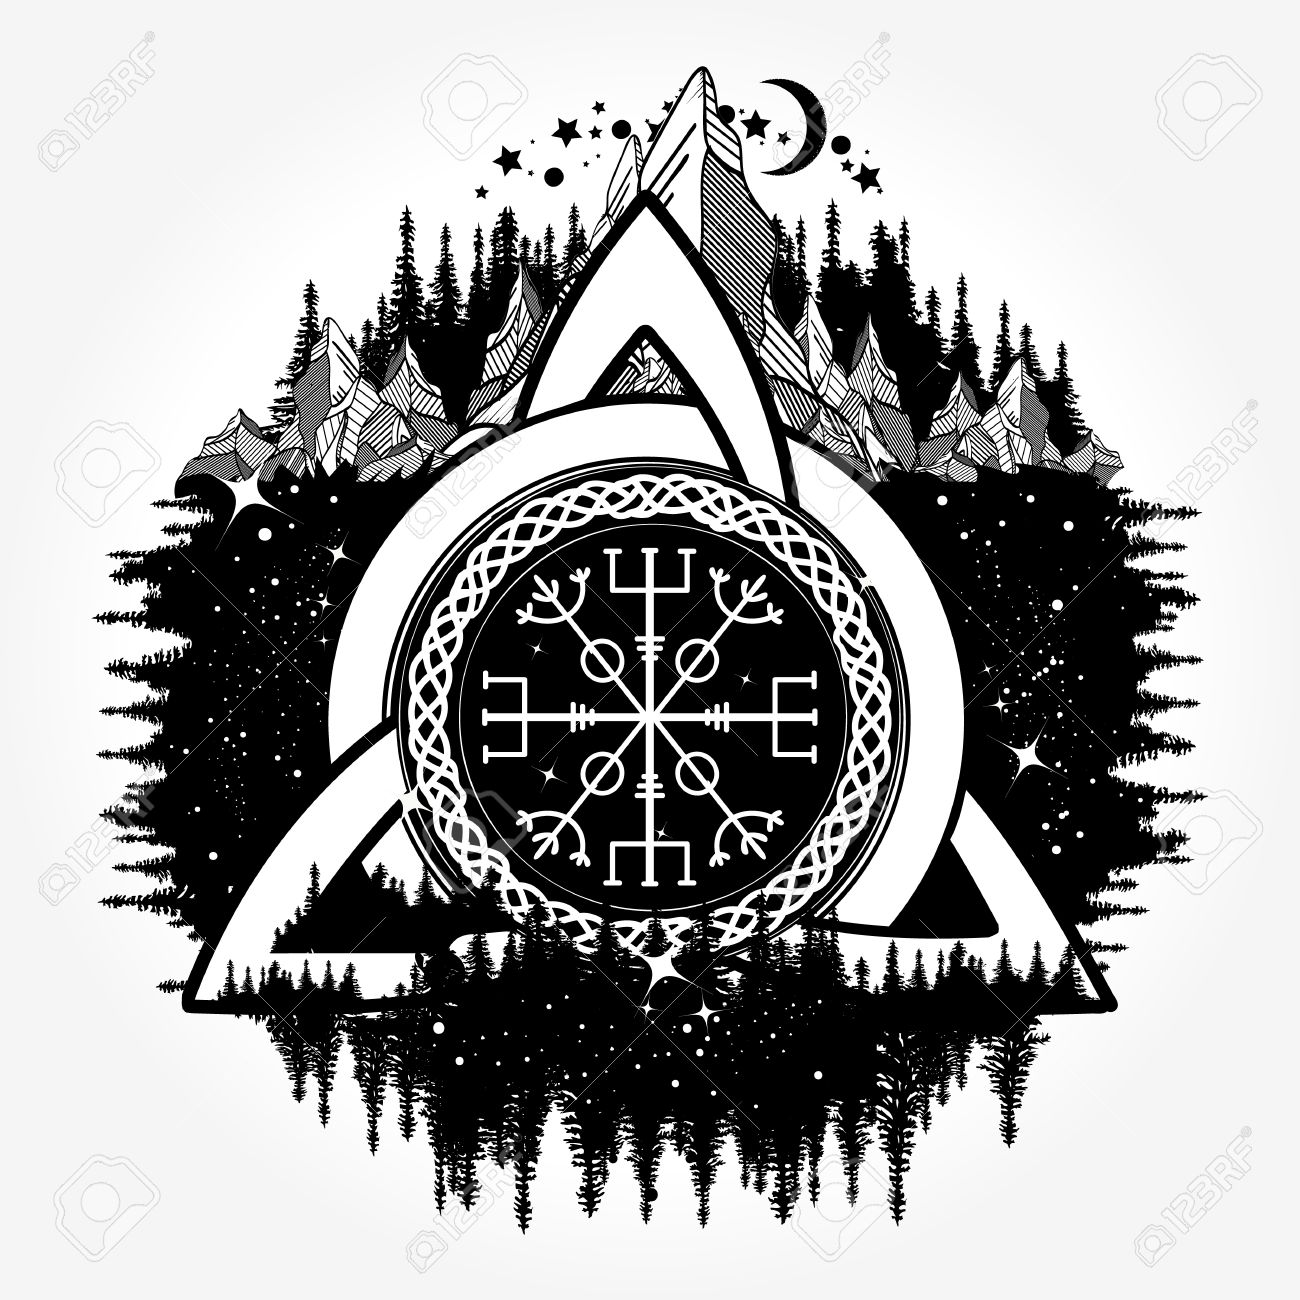 Celtic tattoo boho style t shirt design royalty free cliparts celtic tattoo boho style t shirt design stock vector 84740529 biocorpaavc Gallery